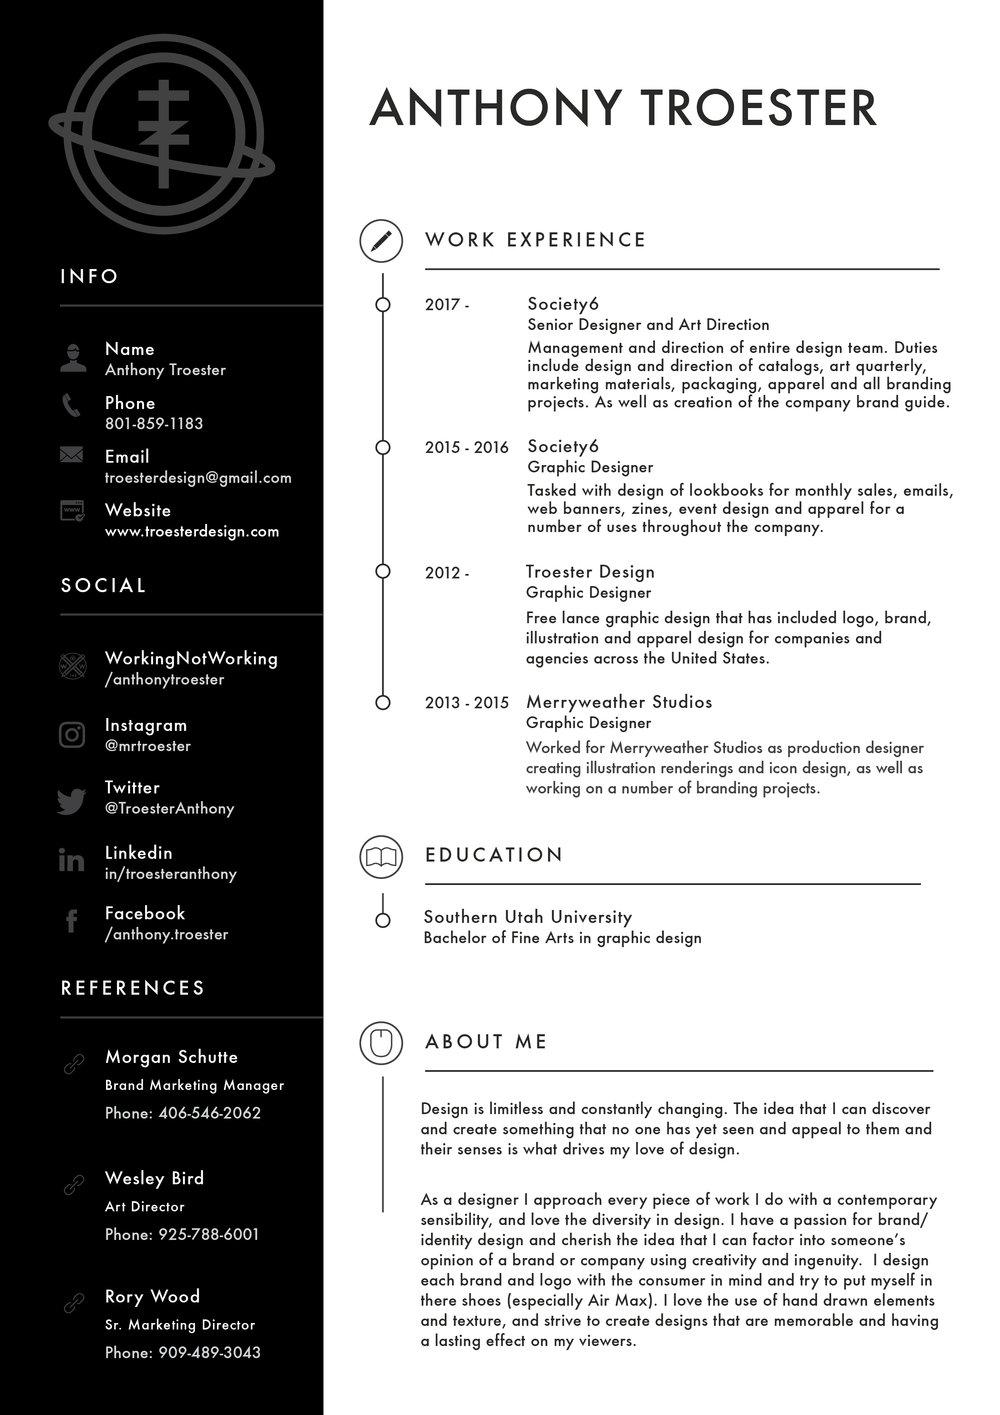 Resume-2018-Aug.jpg